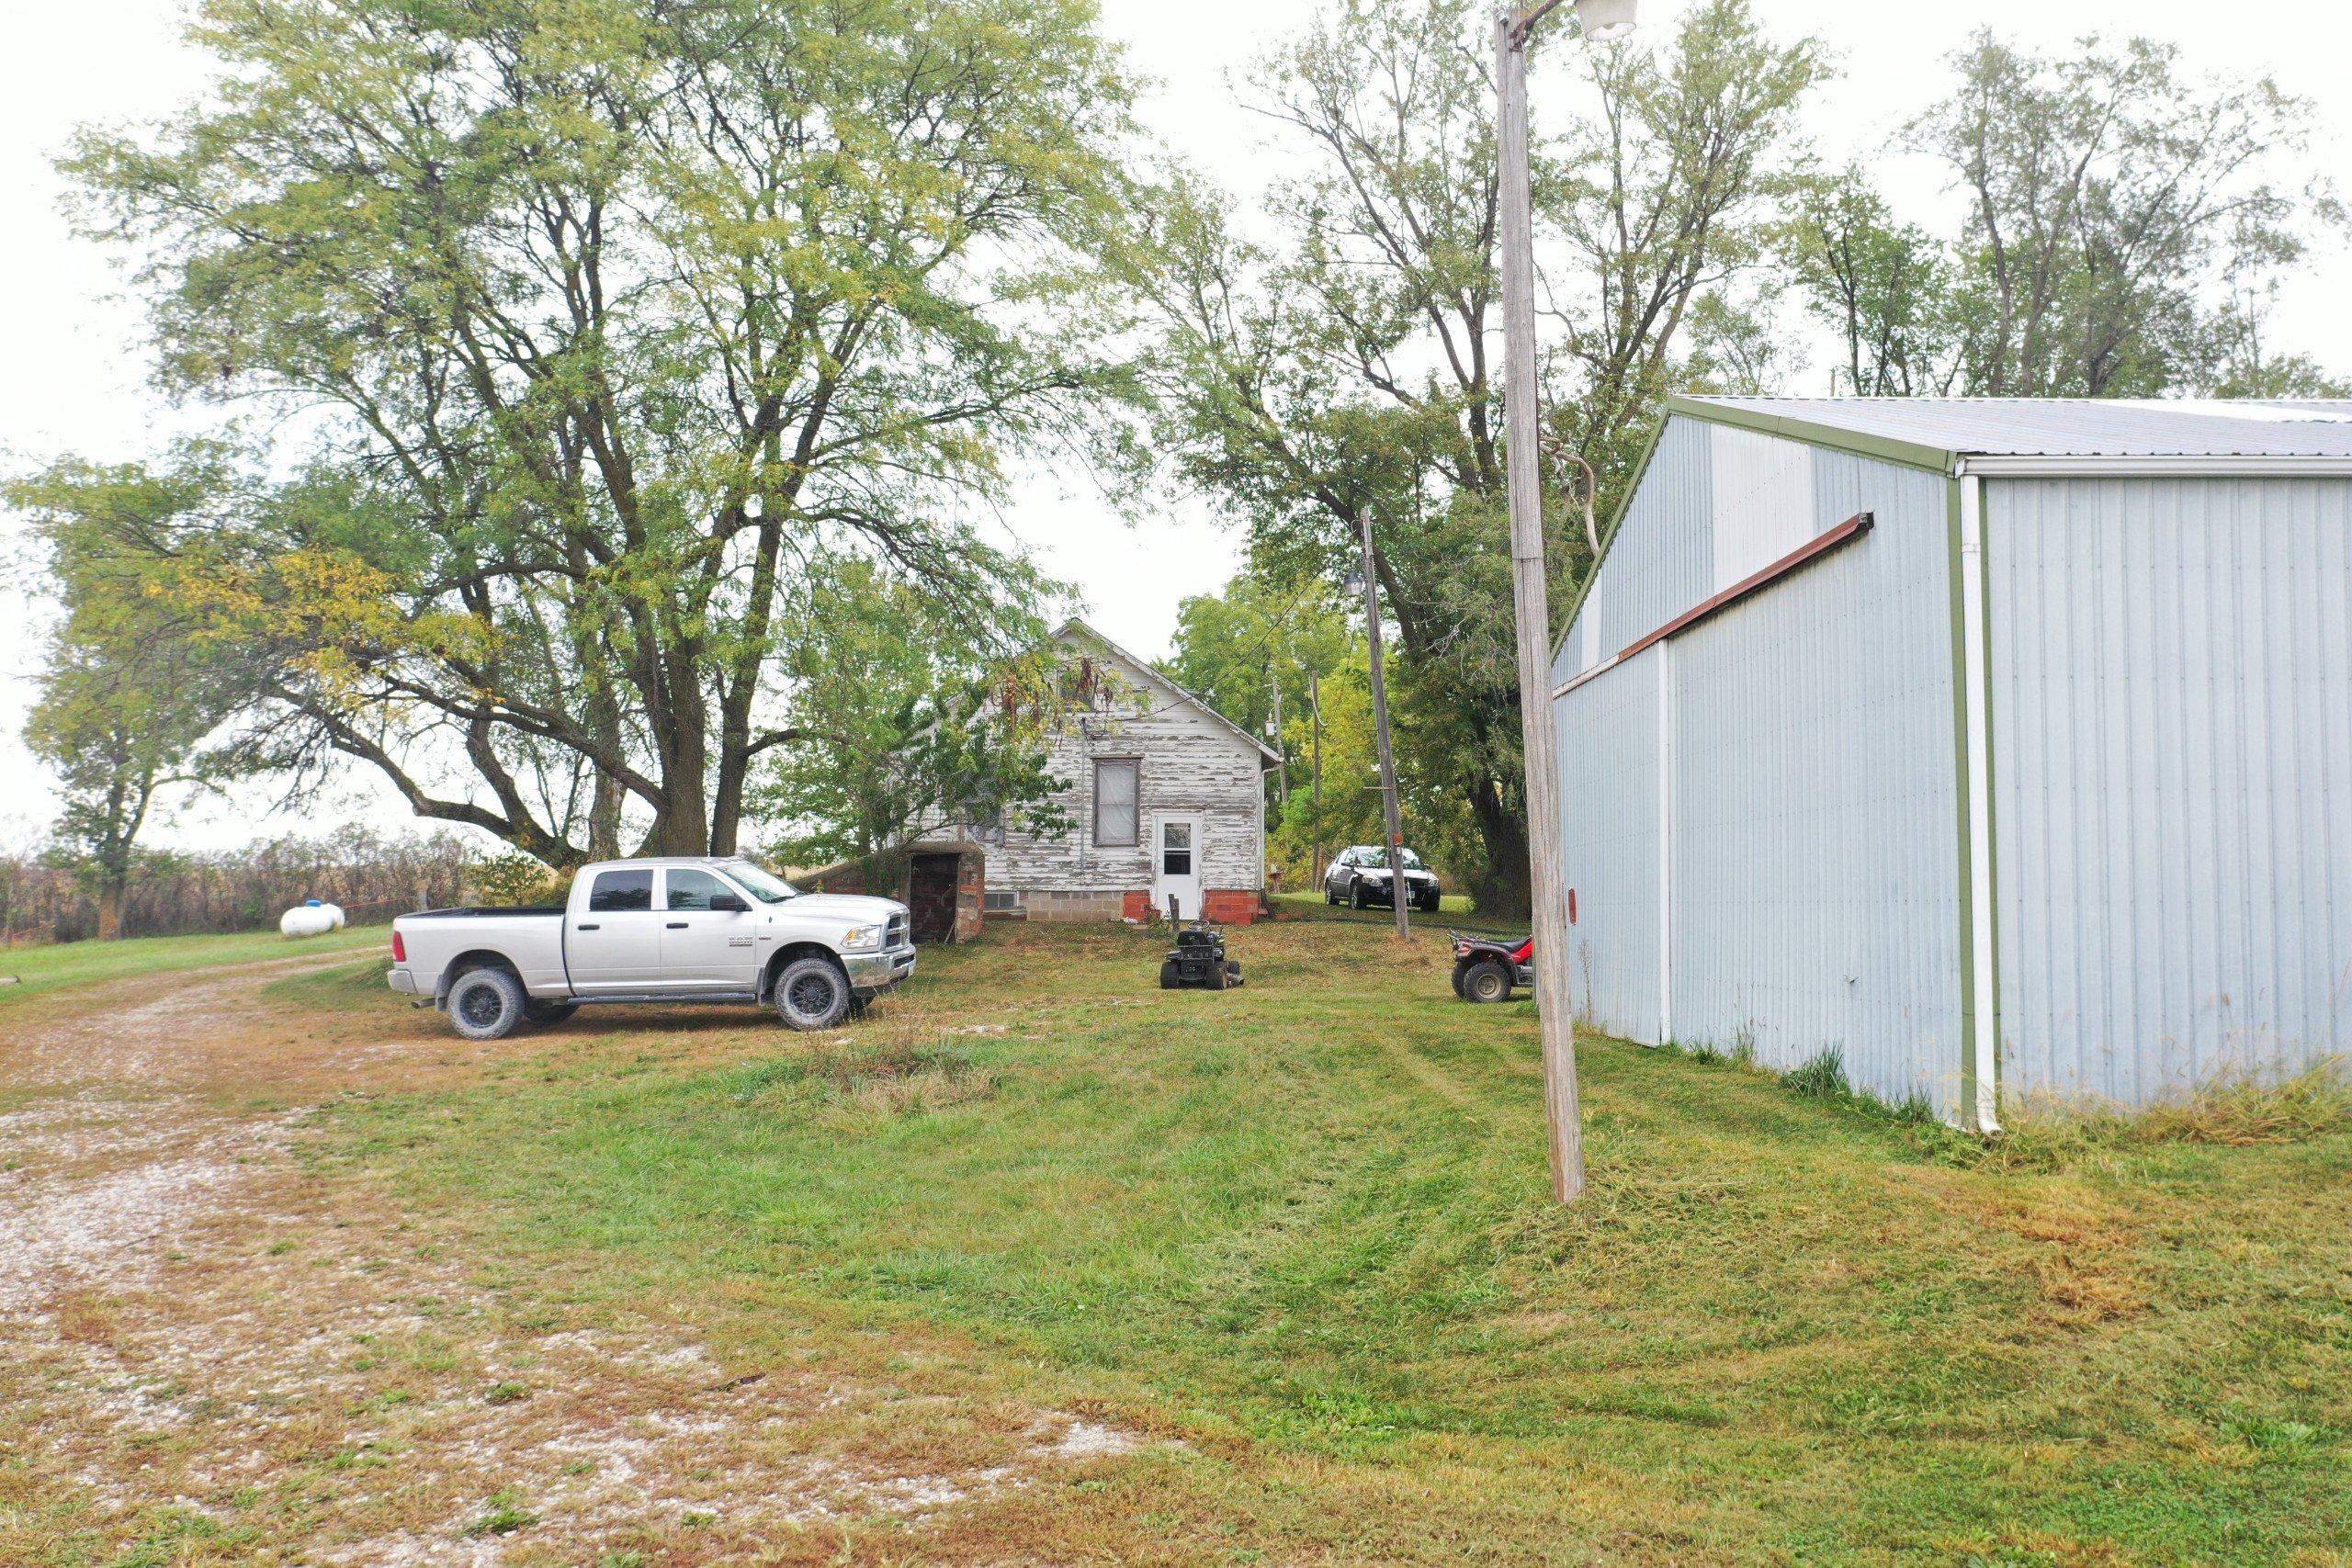 land-warren-county-iowa-200-acres-listing-number-15810-DJI_0577-1.jpg